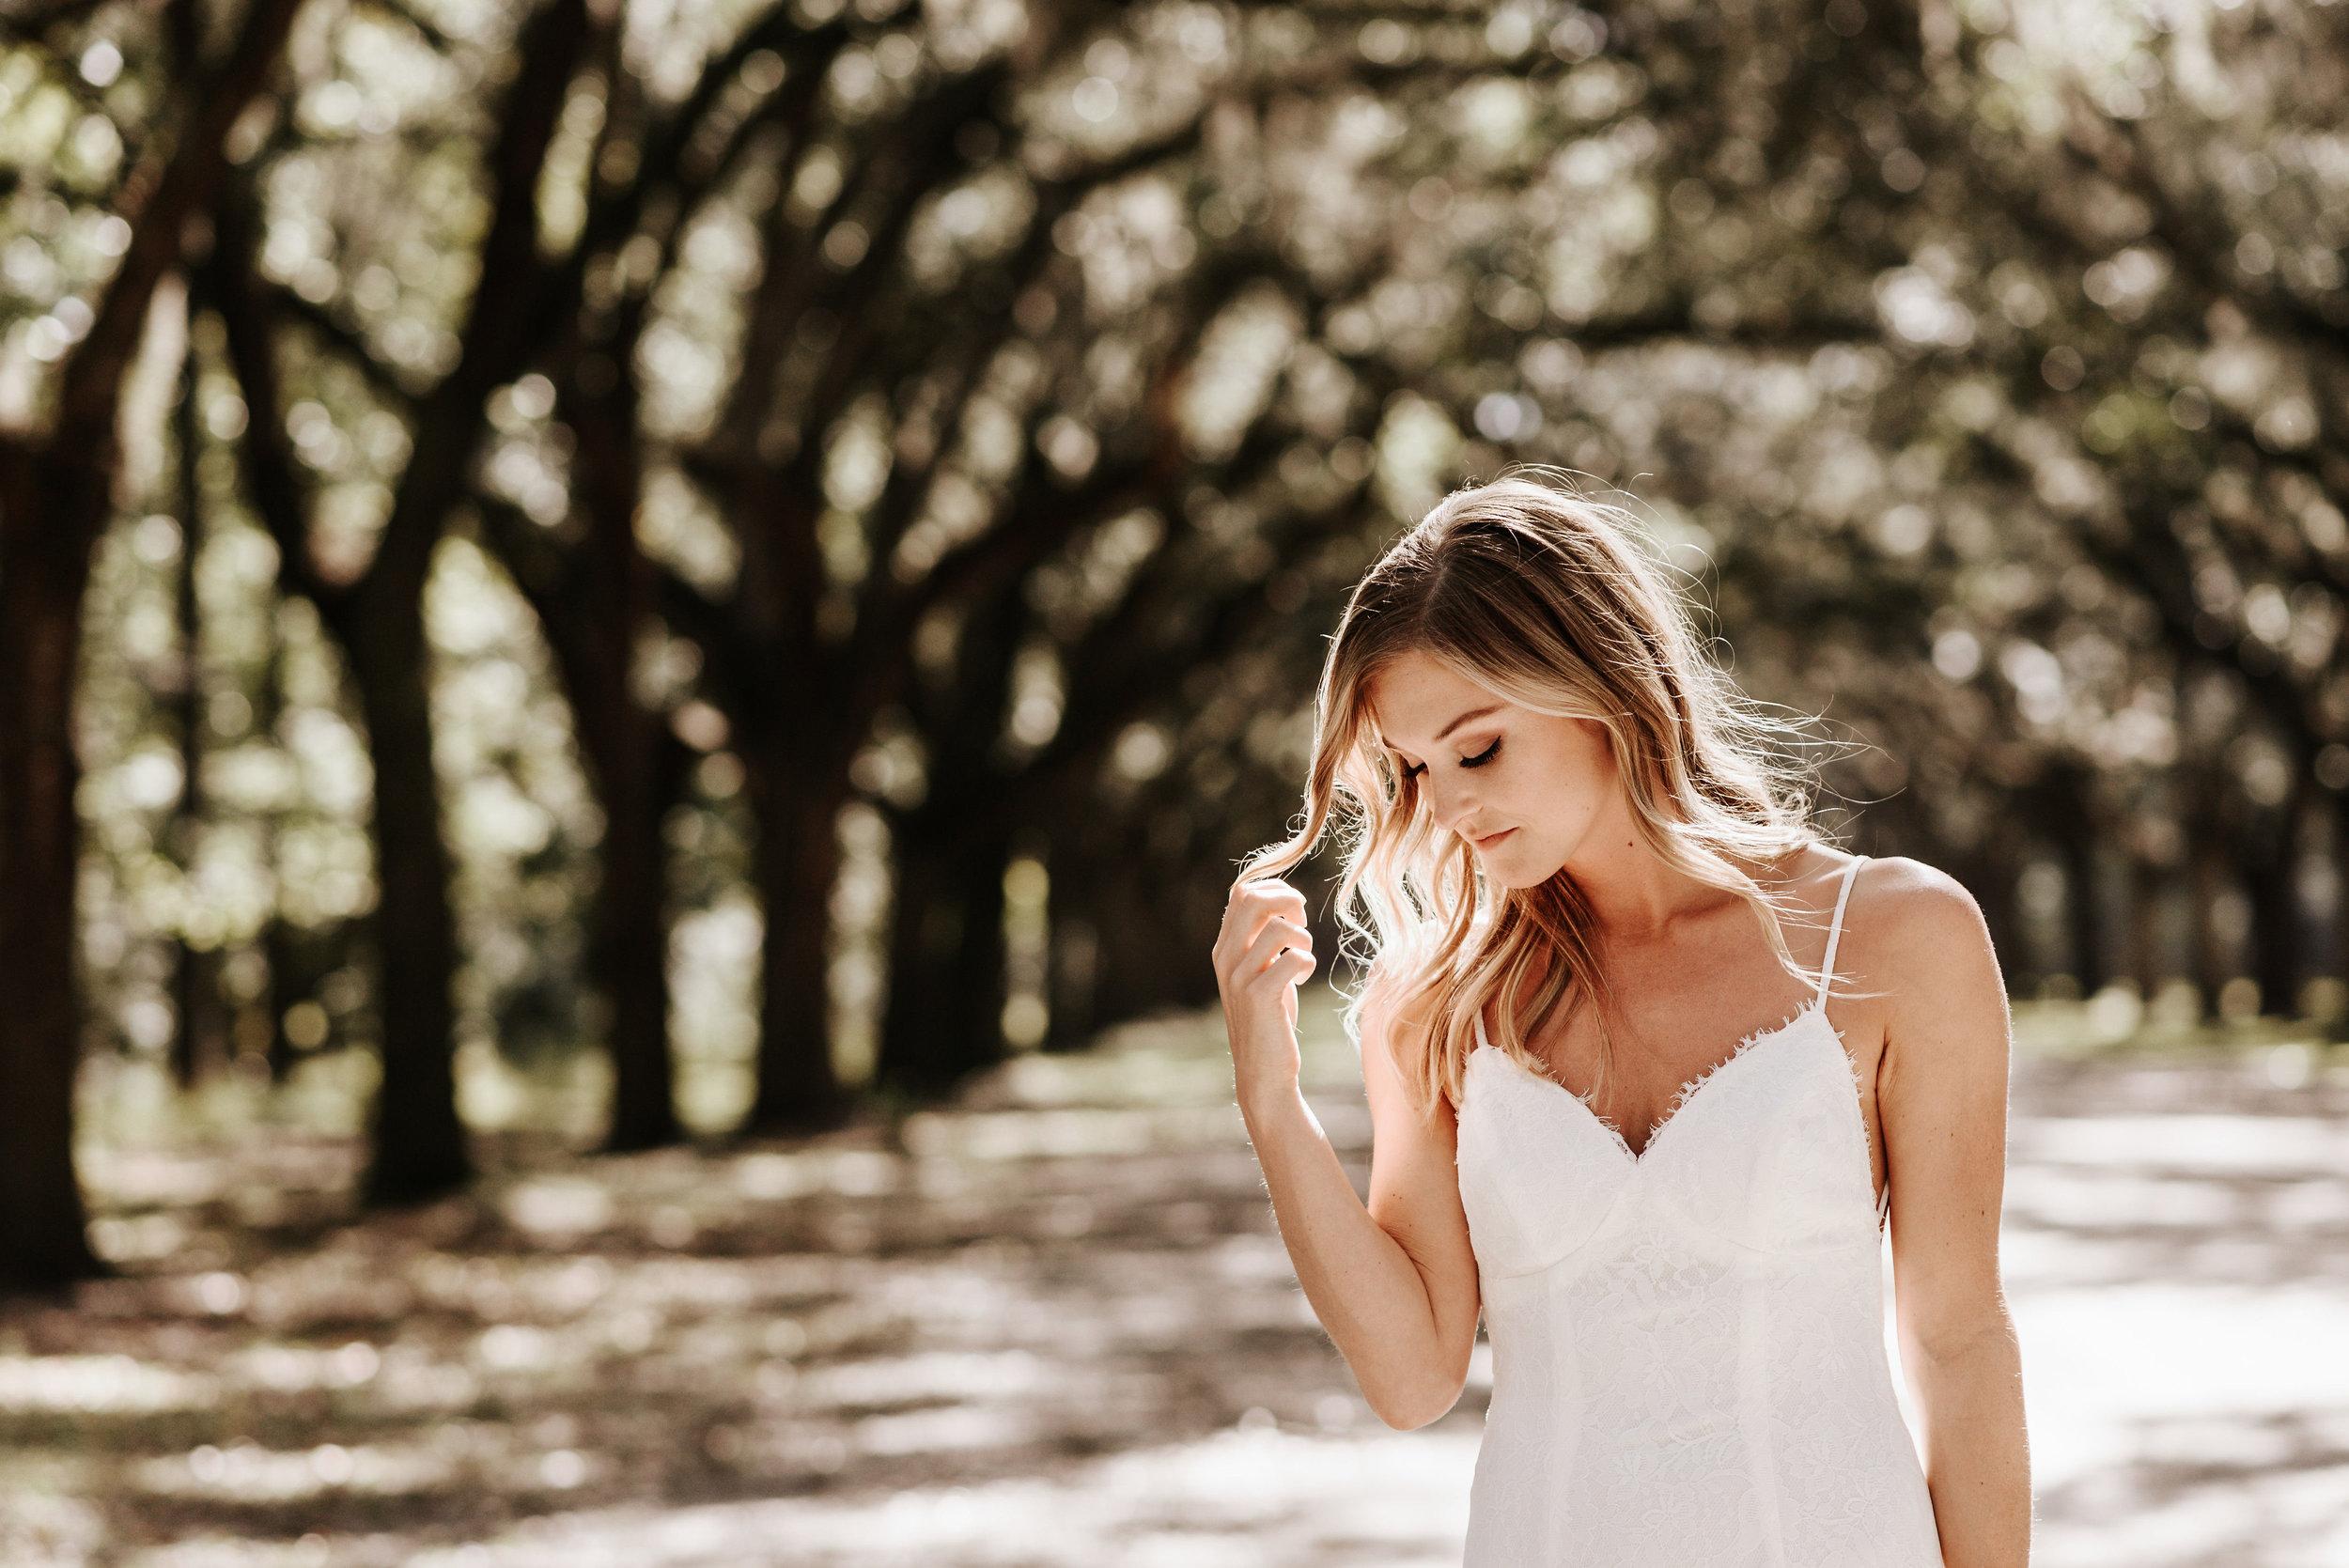 Kourtney_Sean_Savannah_Georgia_Wedding_Wormsloe_Histroic_Site_Coastal_Georgia_Botanical_Gardens_Photography_by_V_6844.jpg